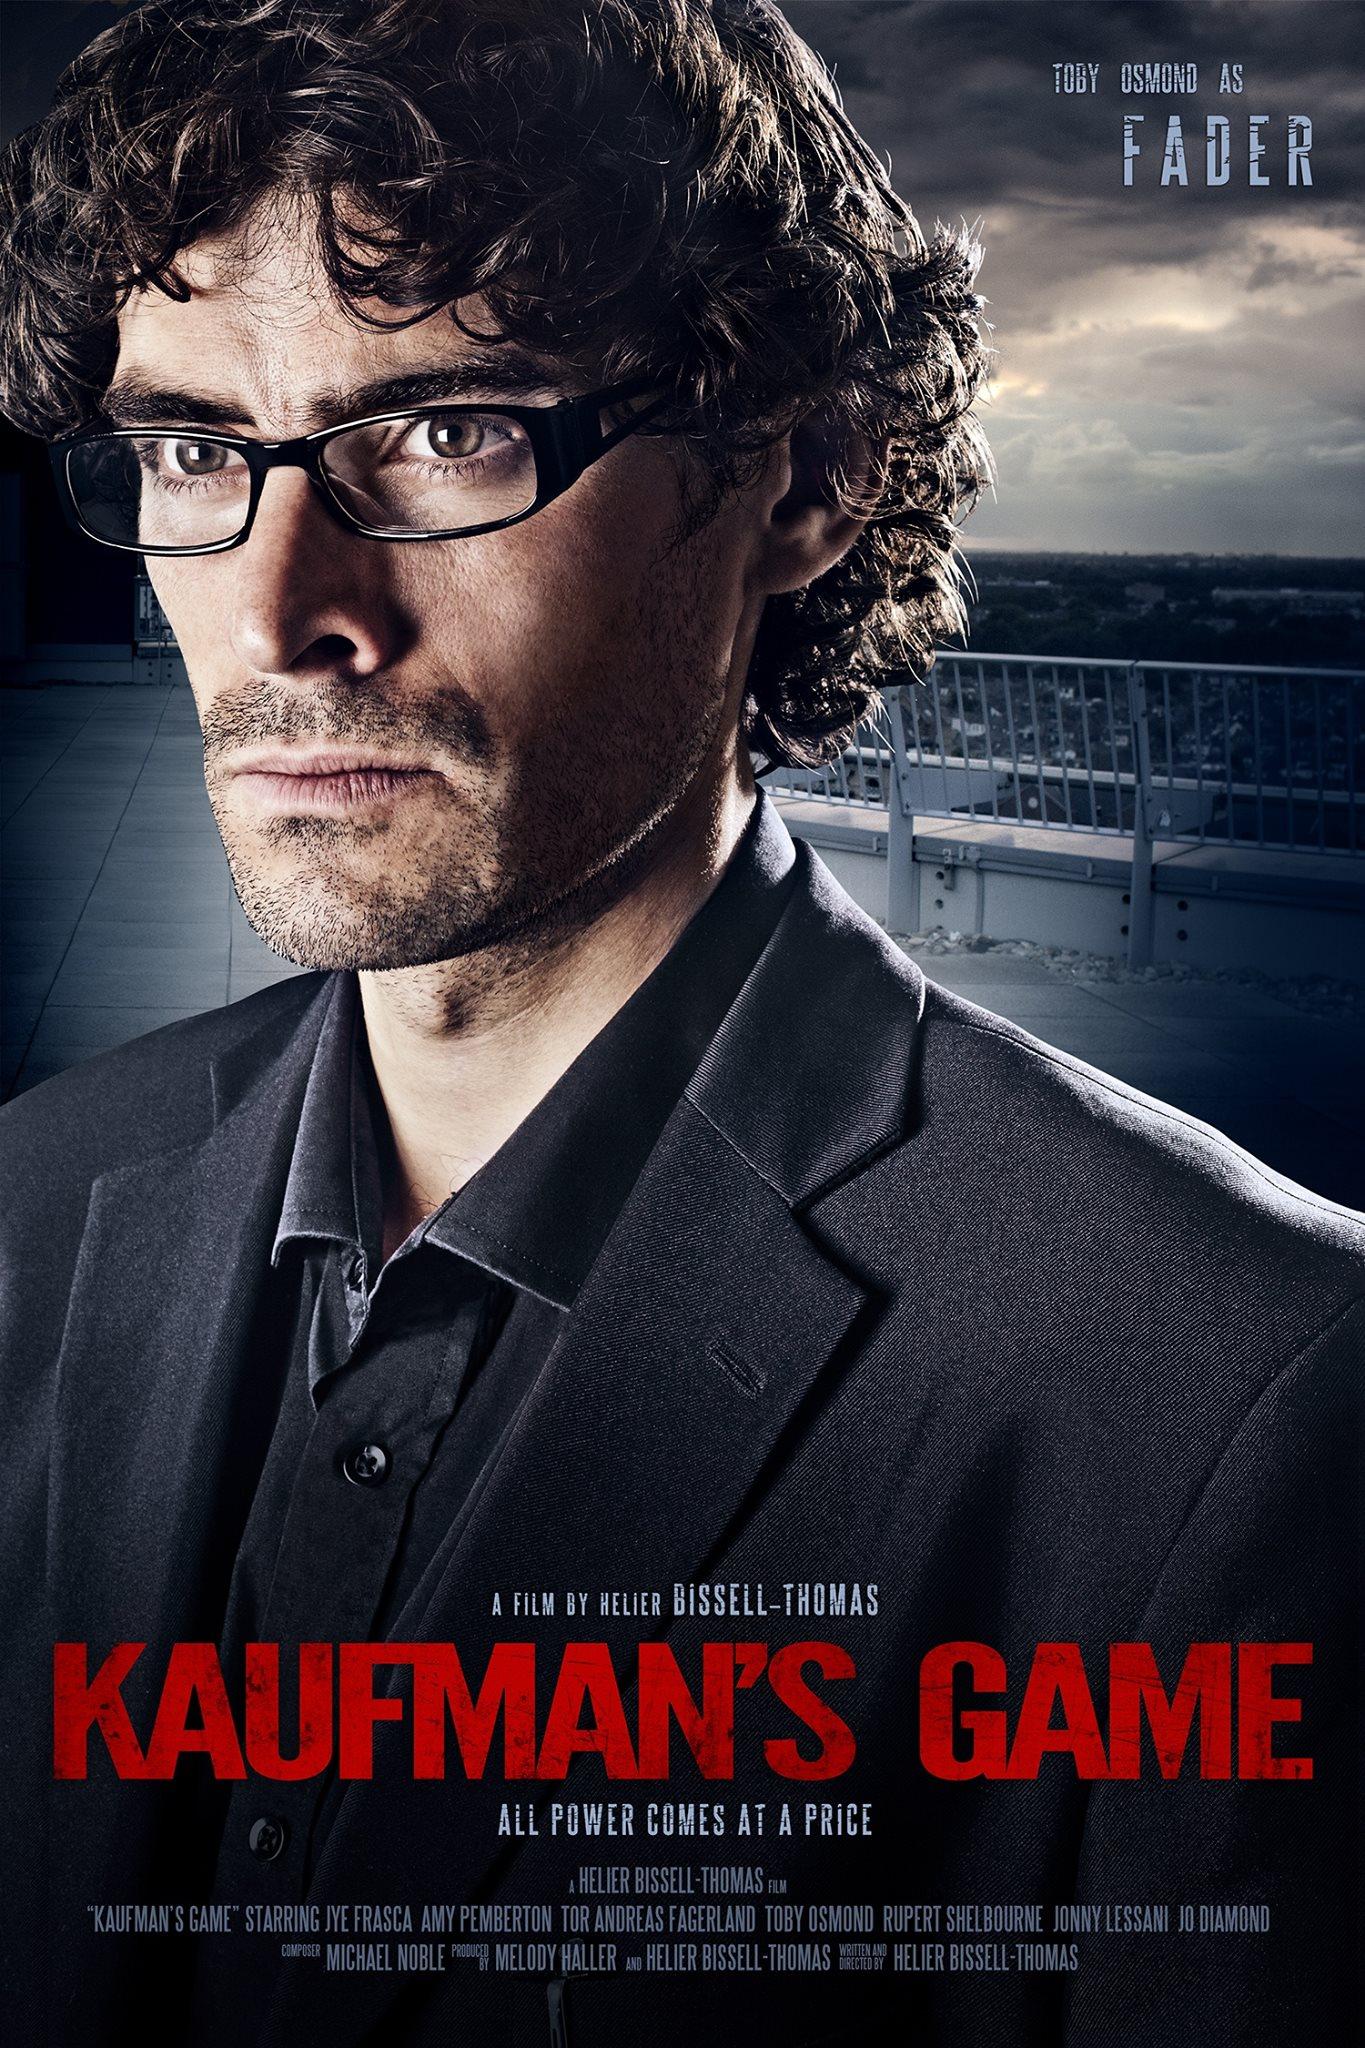 Toby Osmond in Kaufman's Game